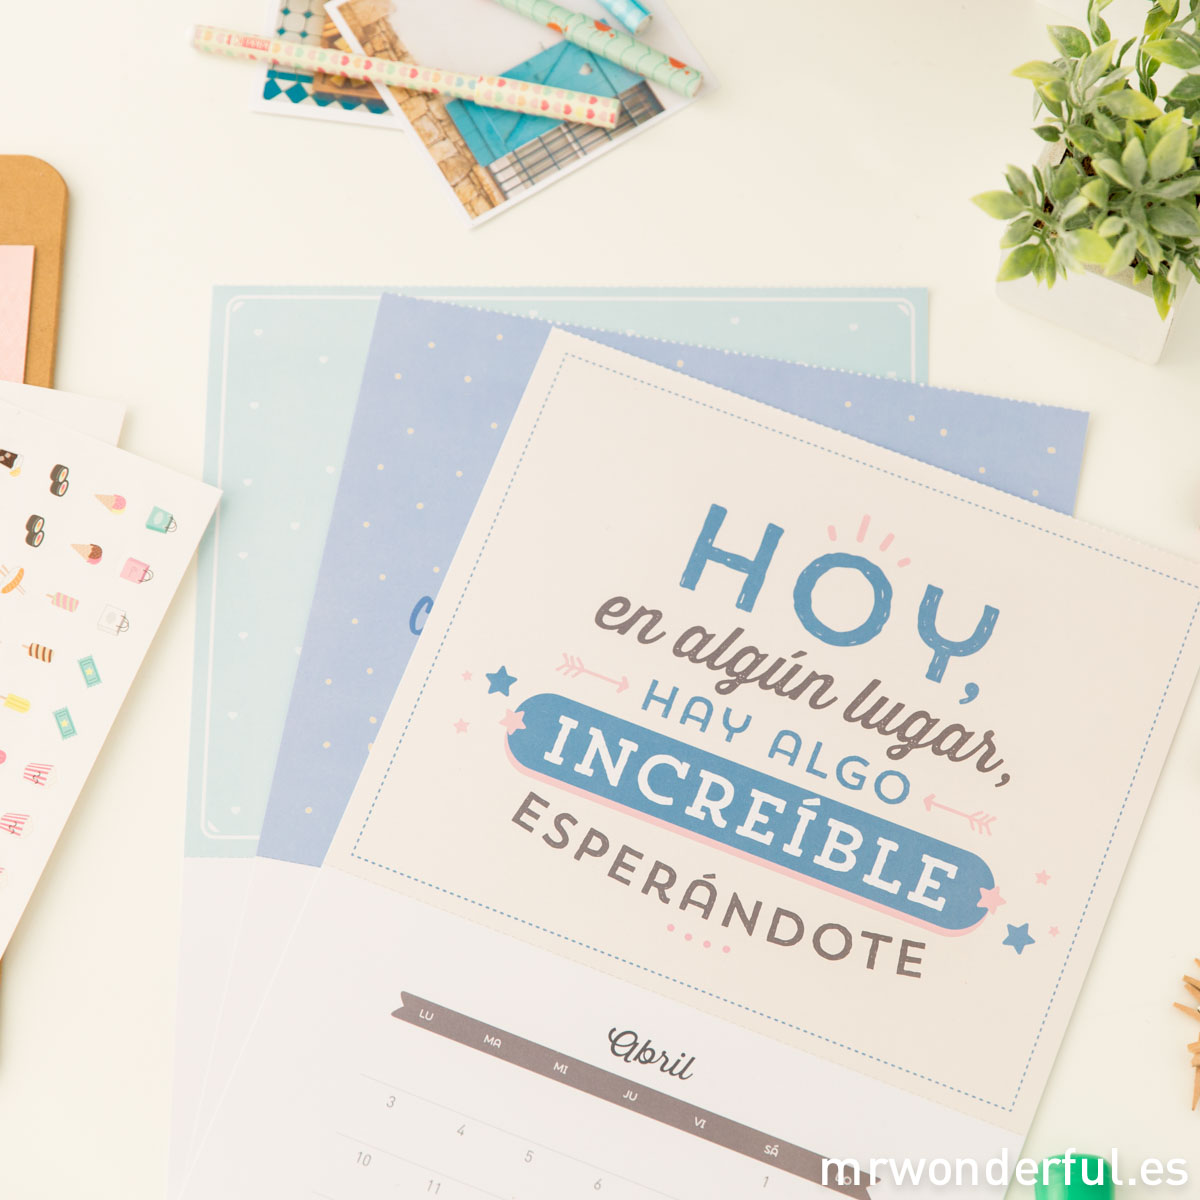 mrwonderful_8435460708371_WOA03743ES_Calendario-de-pared-2017-Un-ano-para-reír-bailar_ES-49